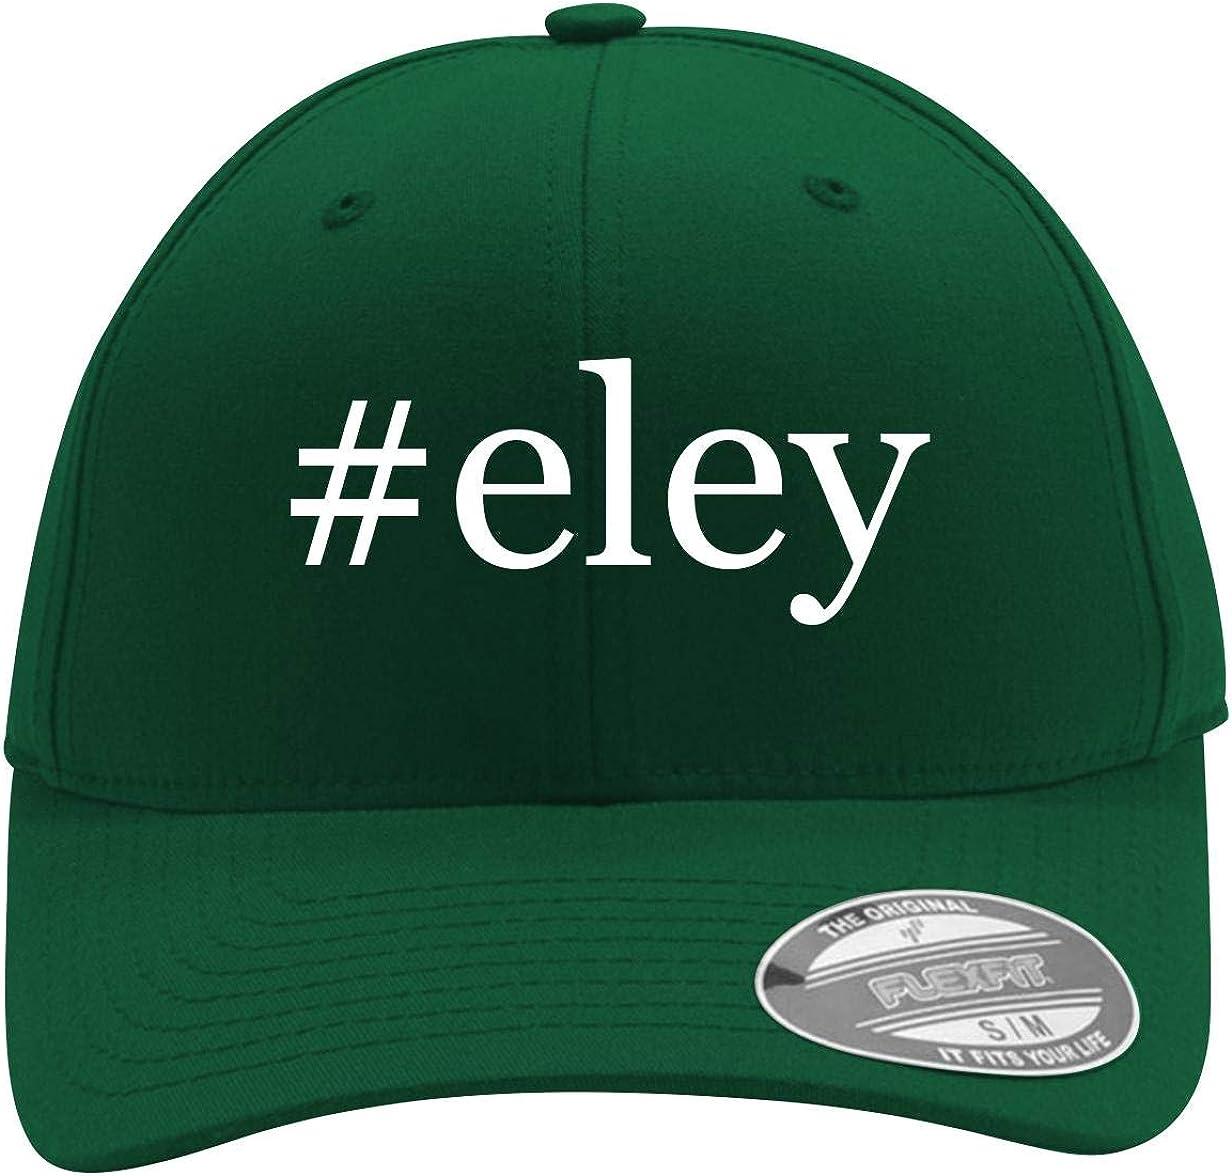 #Eley - Men's Hashtag Flexfit Baseball Cap Hat